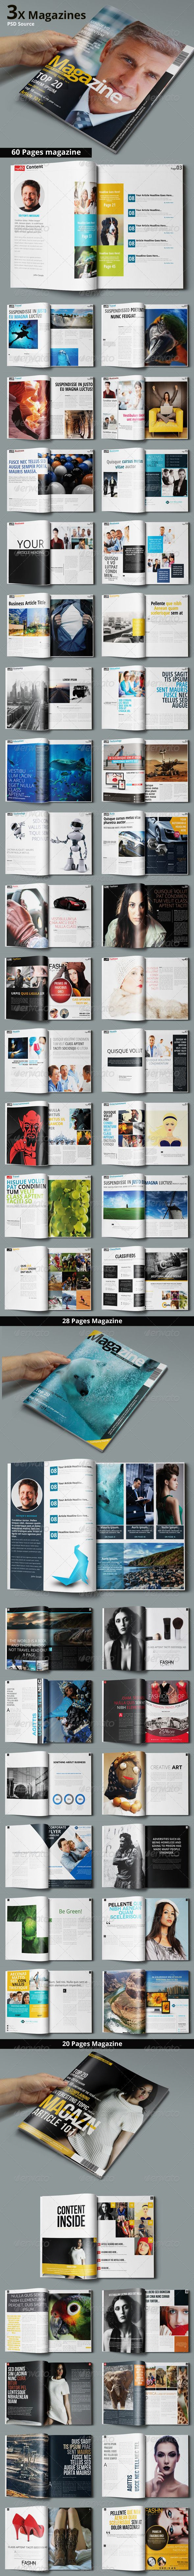 Multipurpose Magazine Bundle - Photoshop PSD — Photoshop PSD #print #design • Available here → https://graphicriver.net/item/multipurpose-magazine-bundle-photoshop-psd/7466589?ref=pxcr